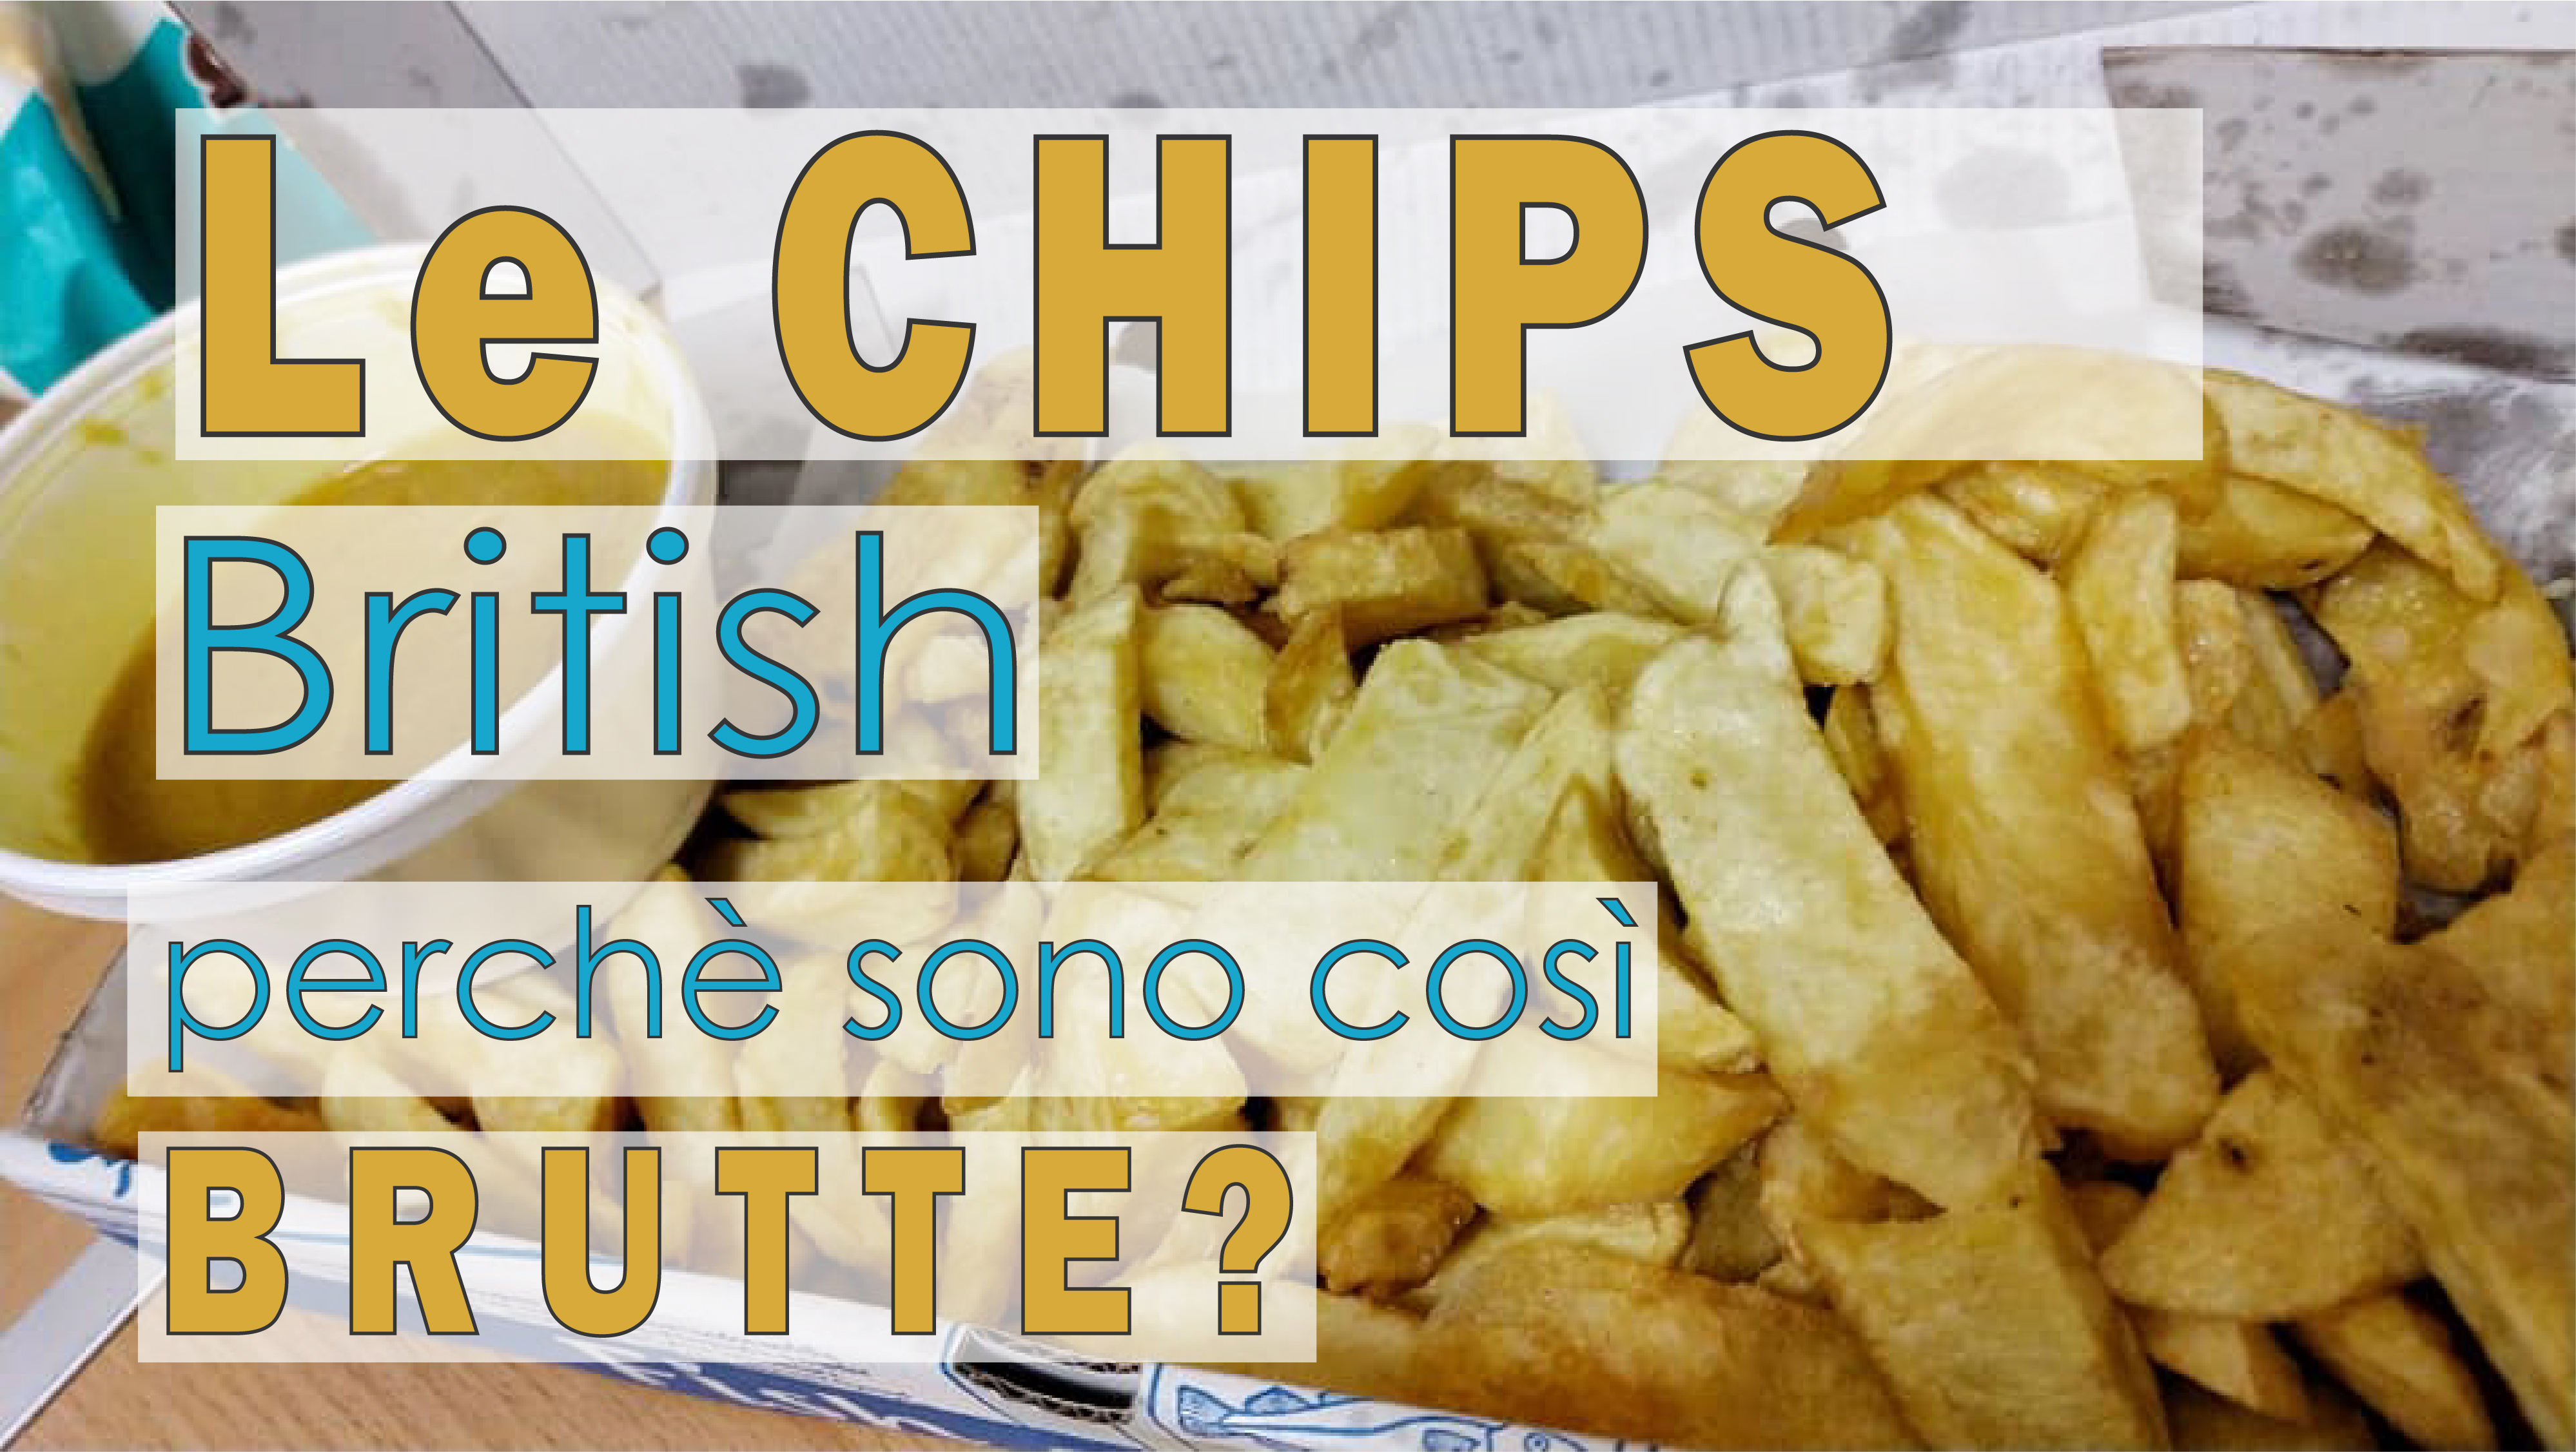 Le Chips Inglesi, perchè son cosi' brutte?